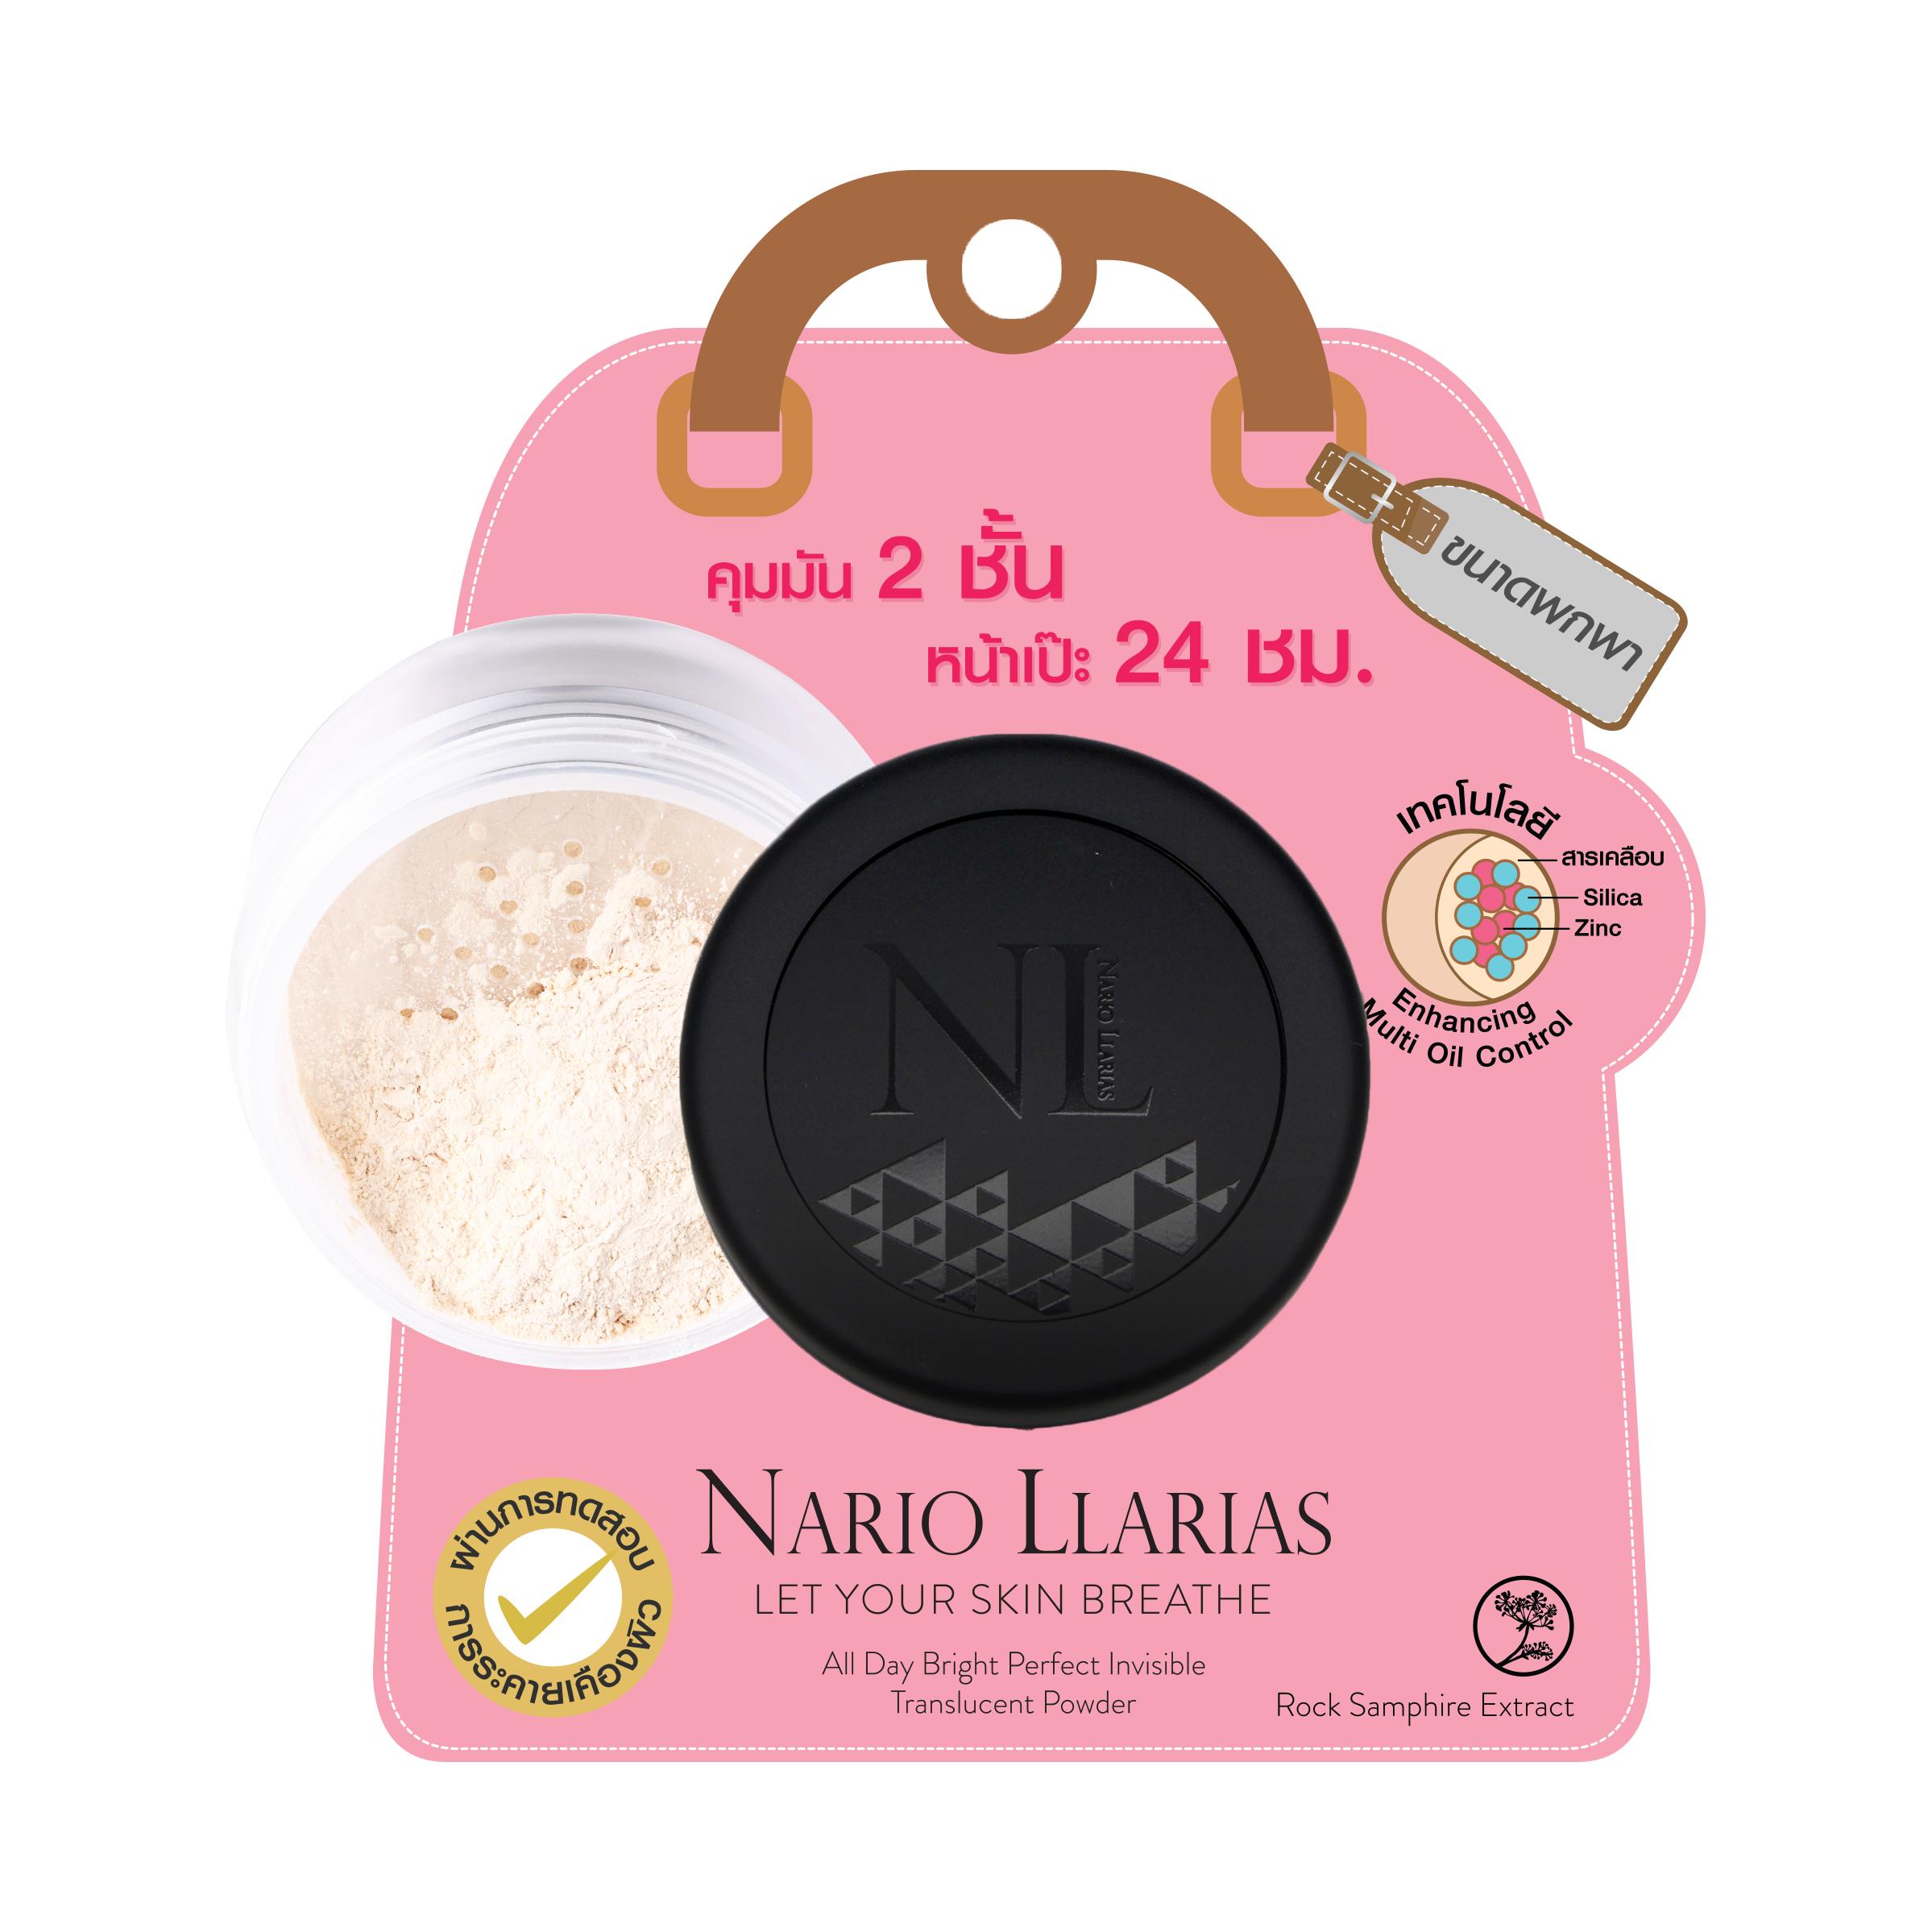 NARIO LLARIAS All Day Bright Perfect Invisible แป้งฝุ่น Translucent ขนาดพกพา